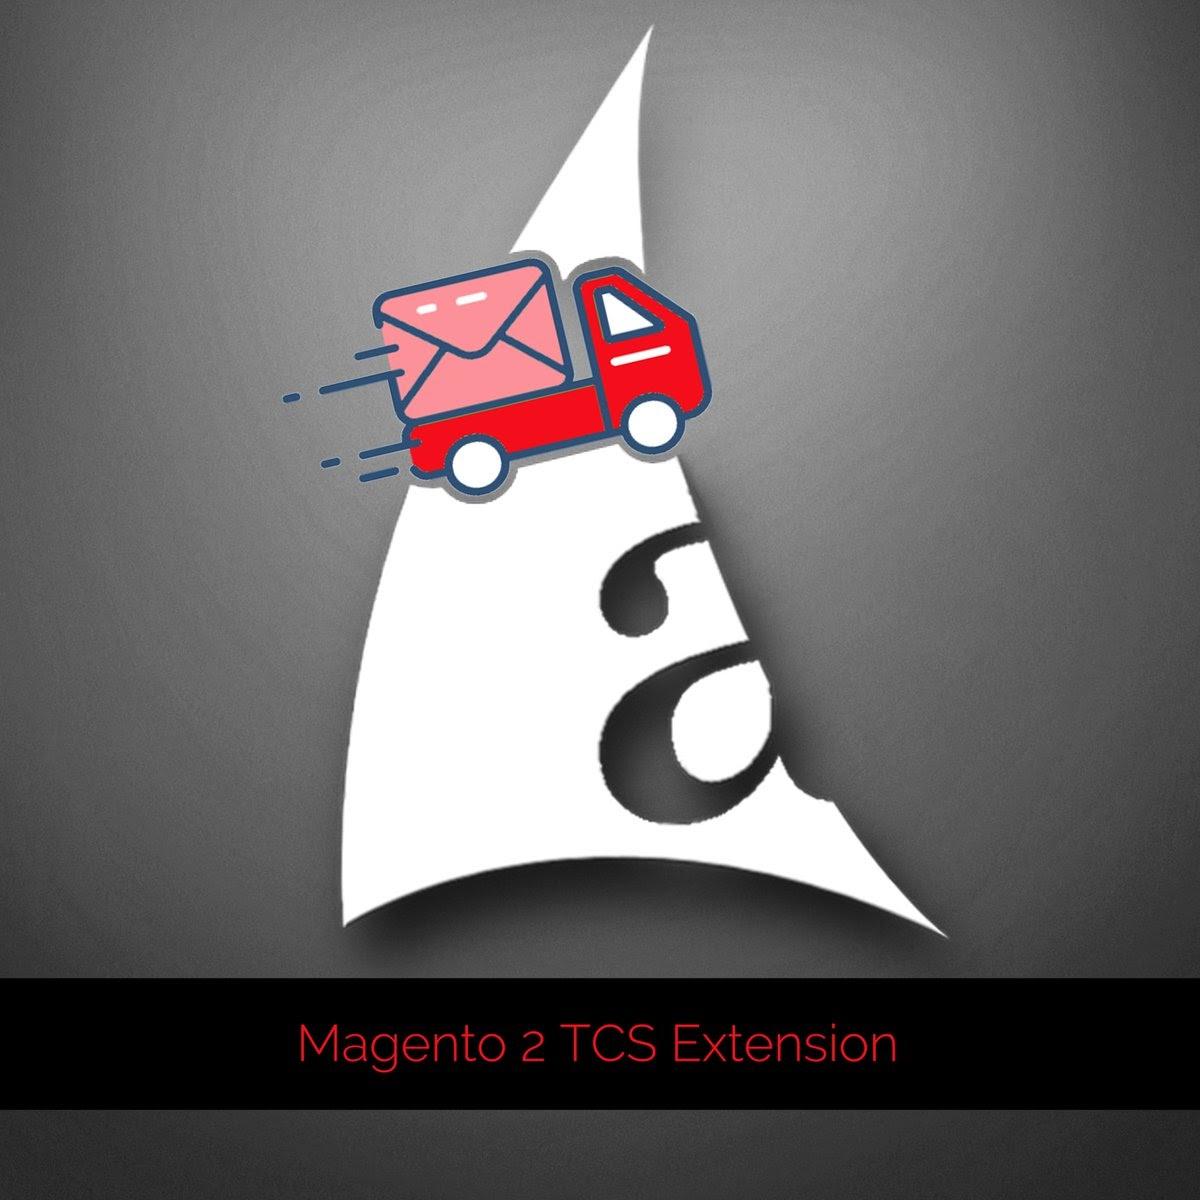 MAGENTO 2 TCS EXTENSION